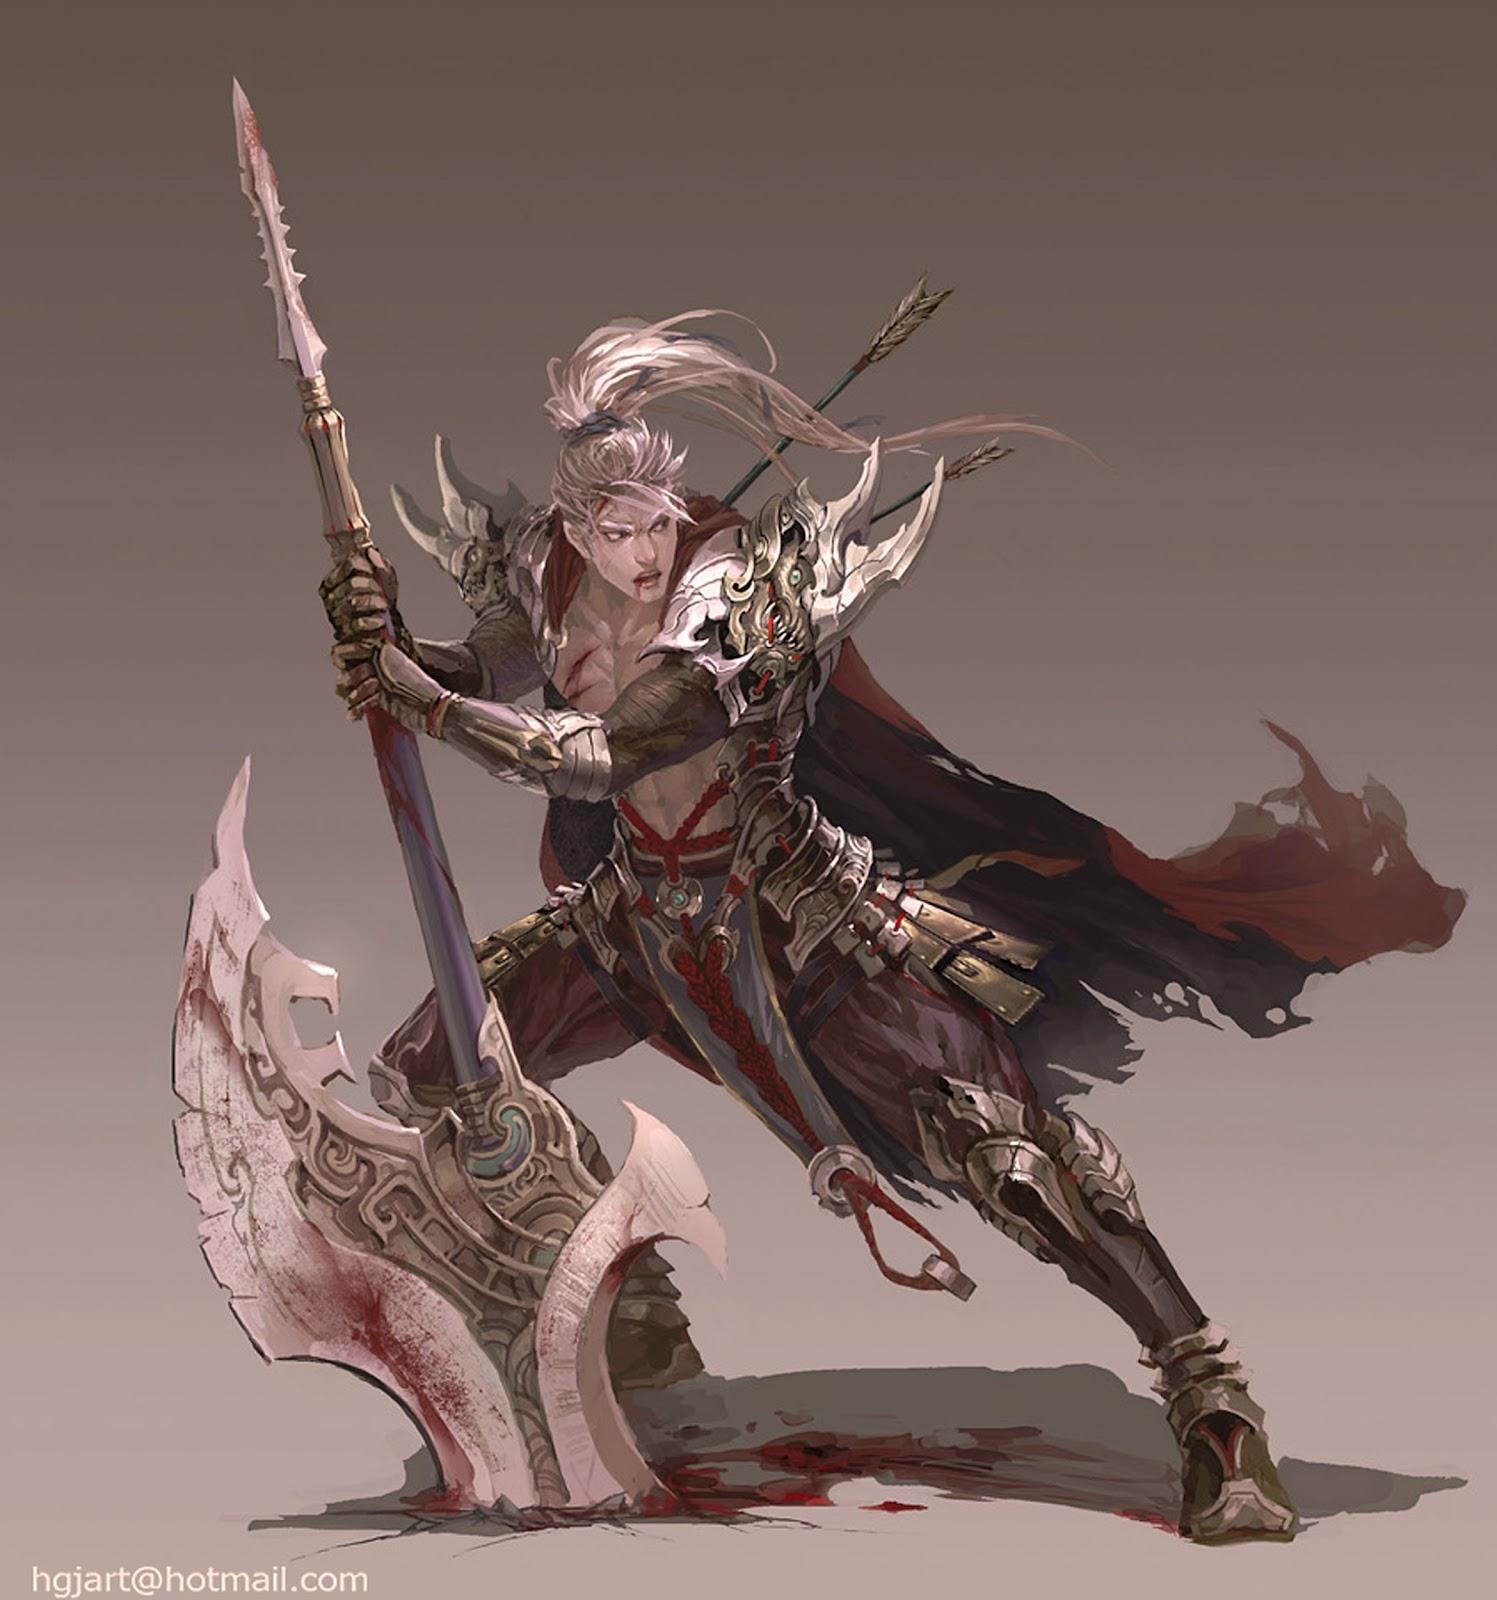 Drawn scythe sci fi  male+mecha+giant+axe+blade+scythe+blade+shogun+ male+mecha+giant+axe+blade+scythe+blade+shogun+japan+samurai+